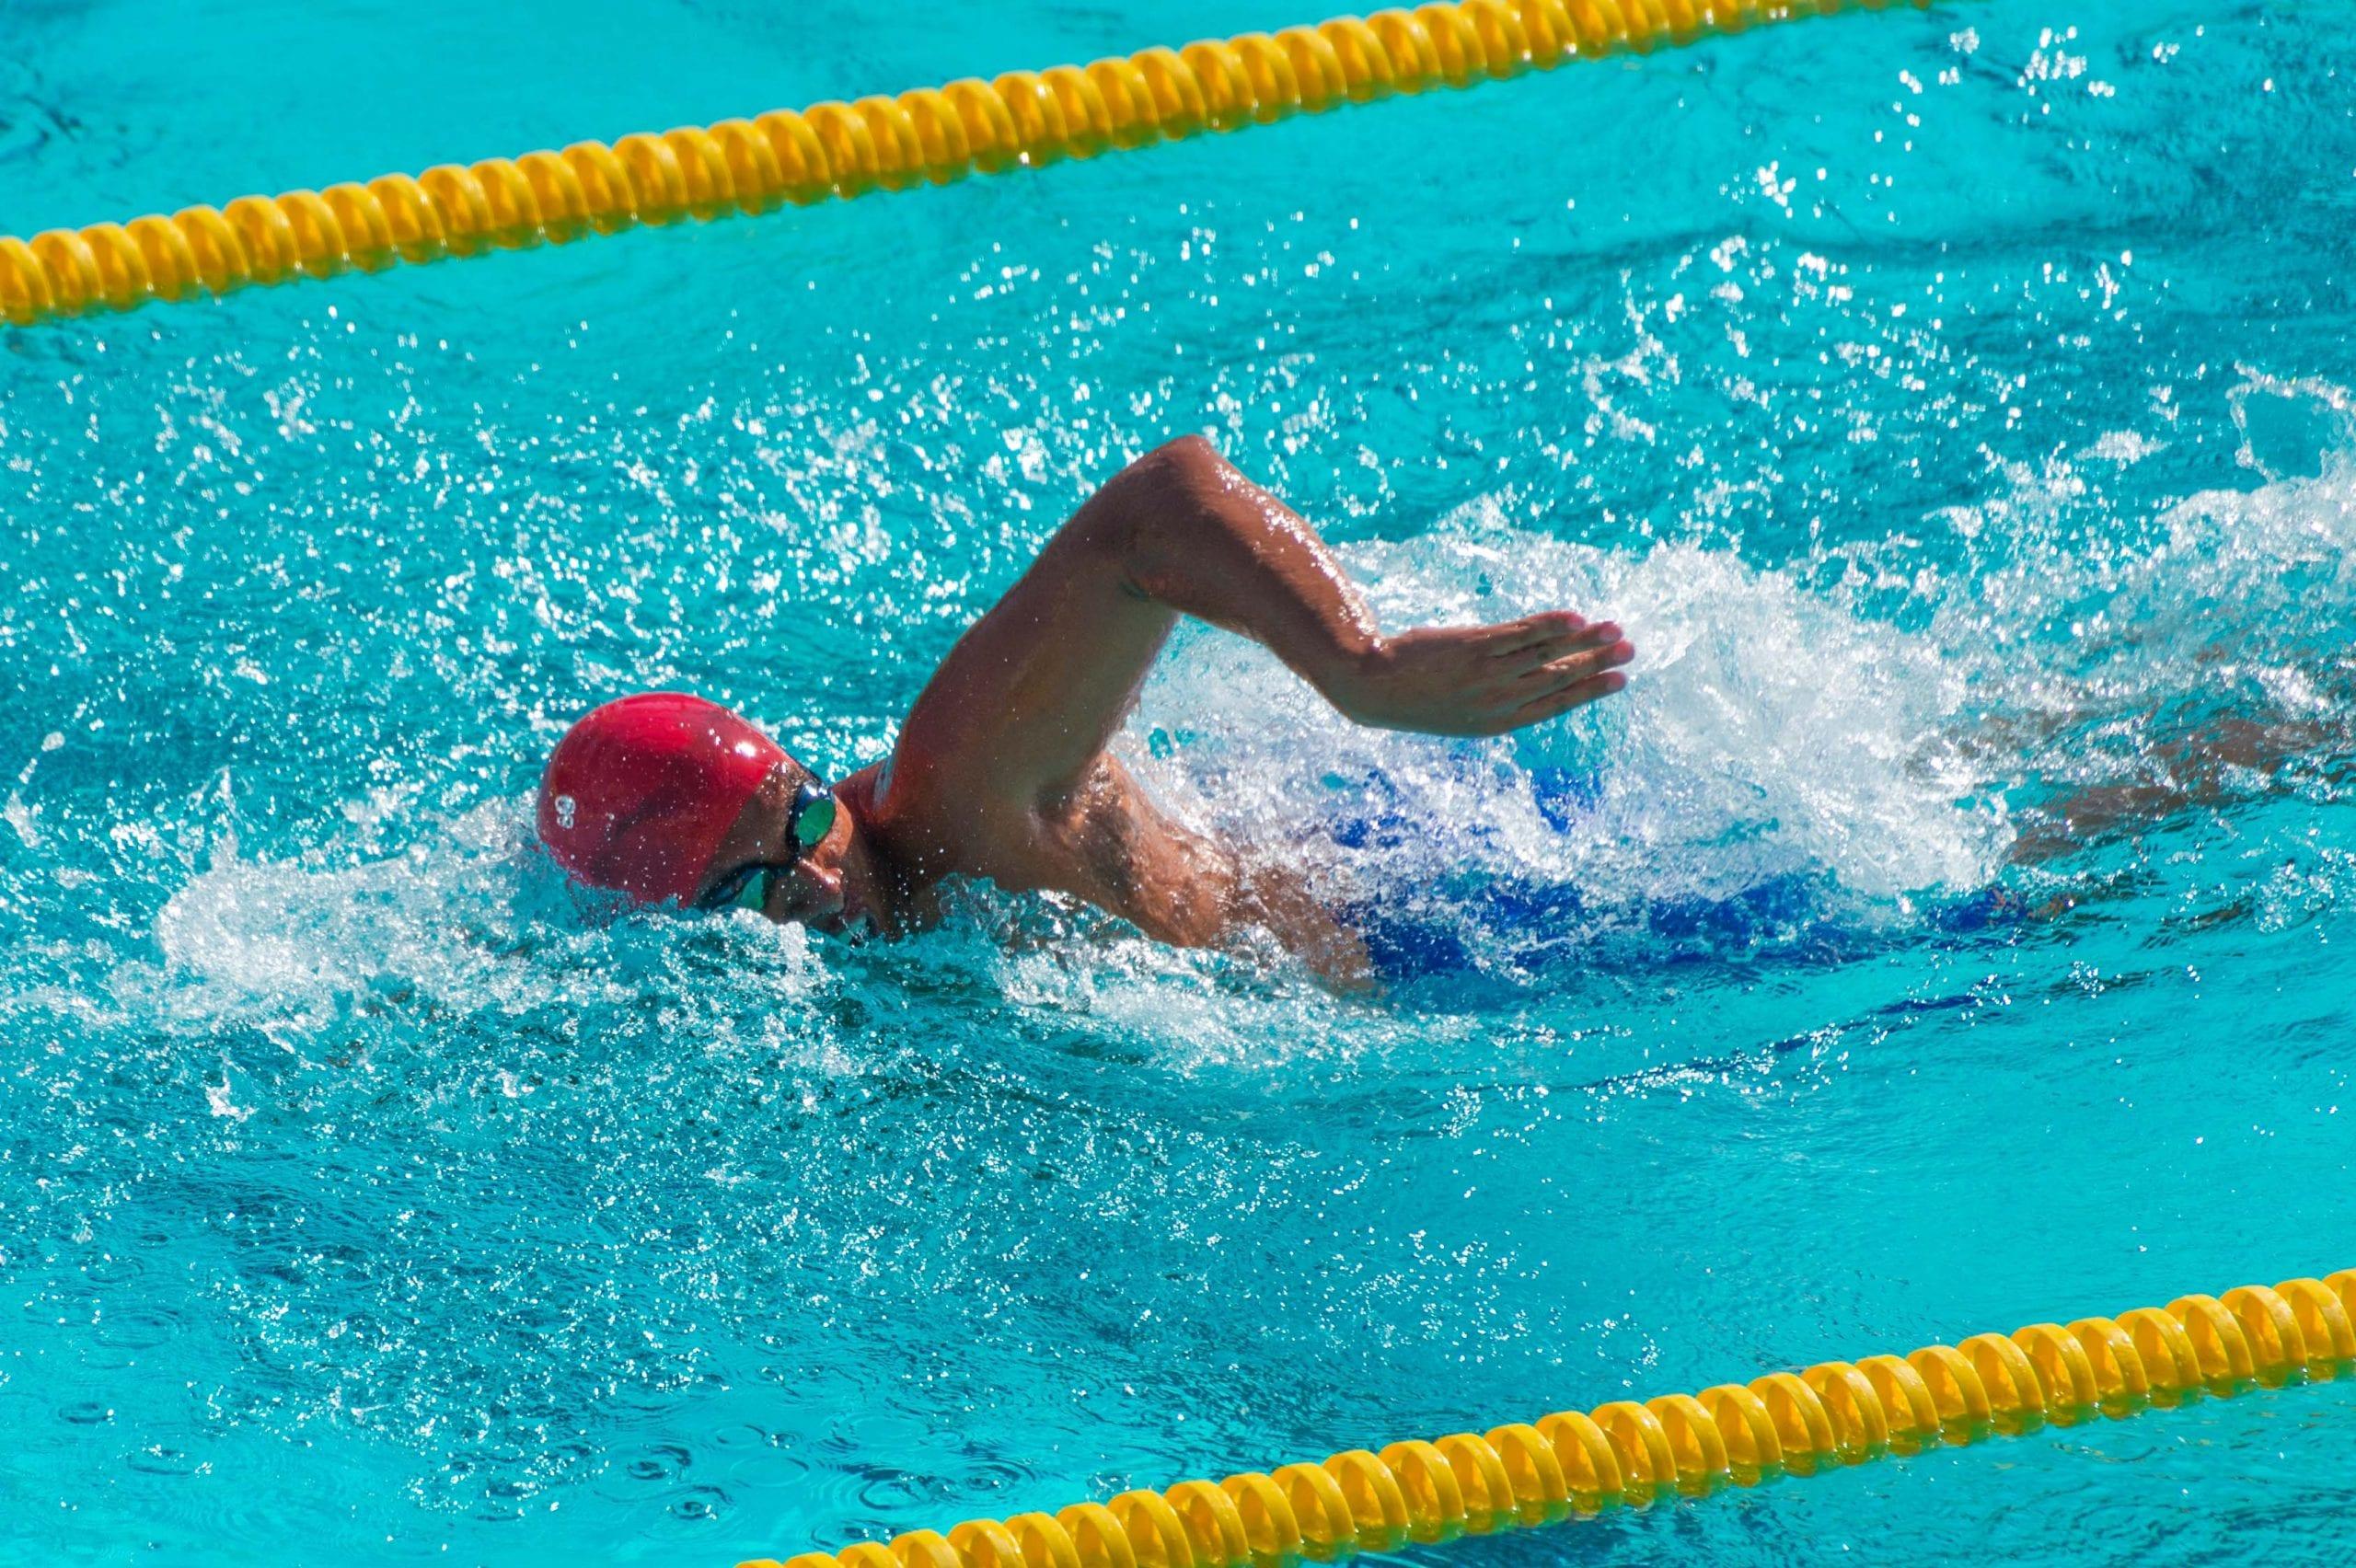 SwimmingSpecO28July2015 (39 of 223)-Edit-2